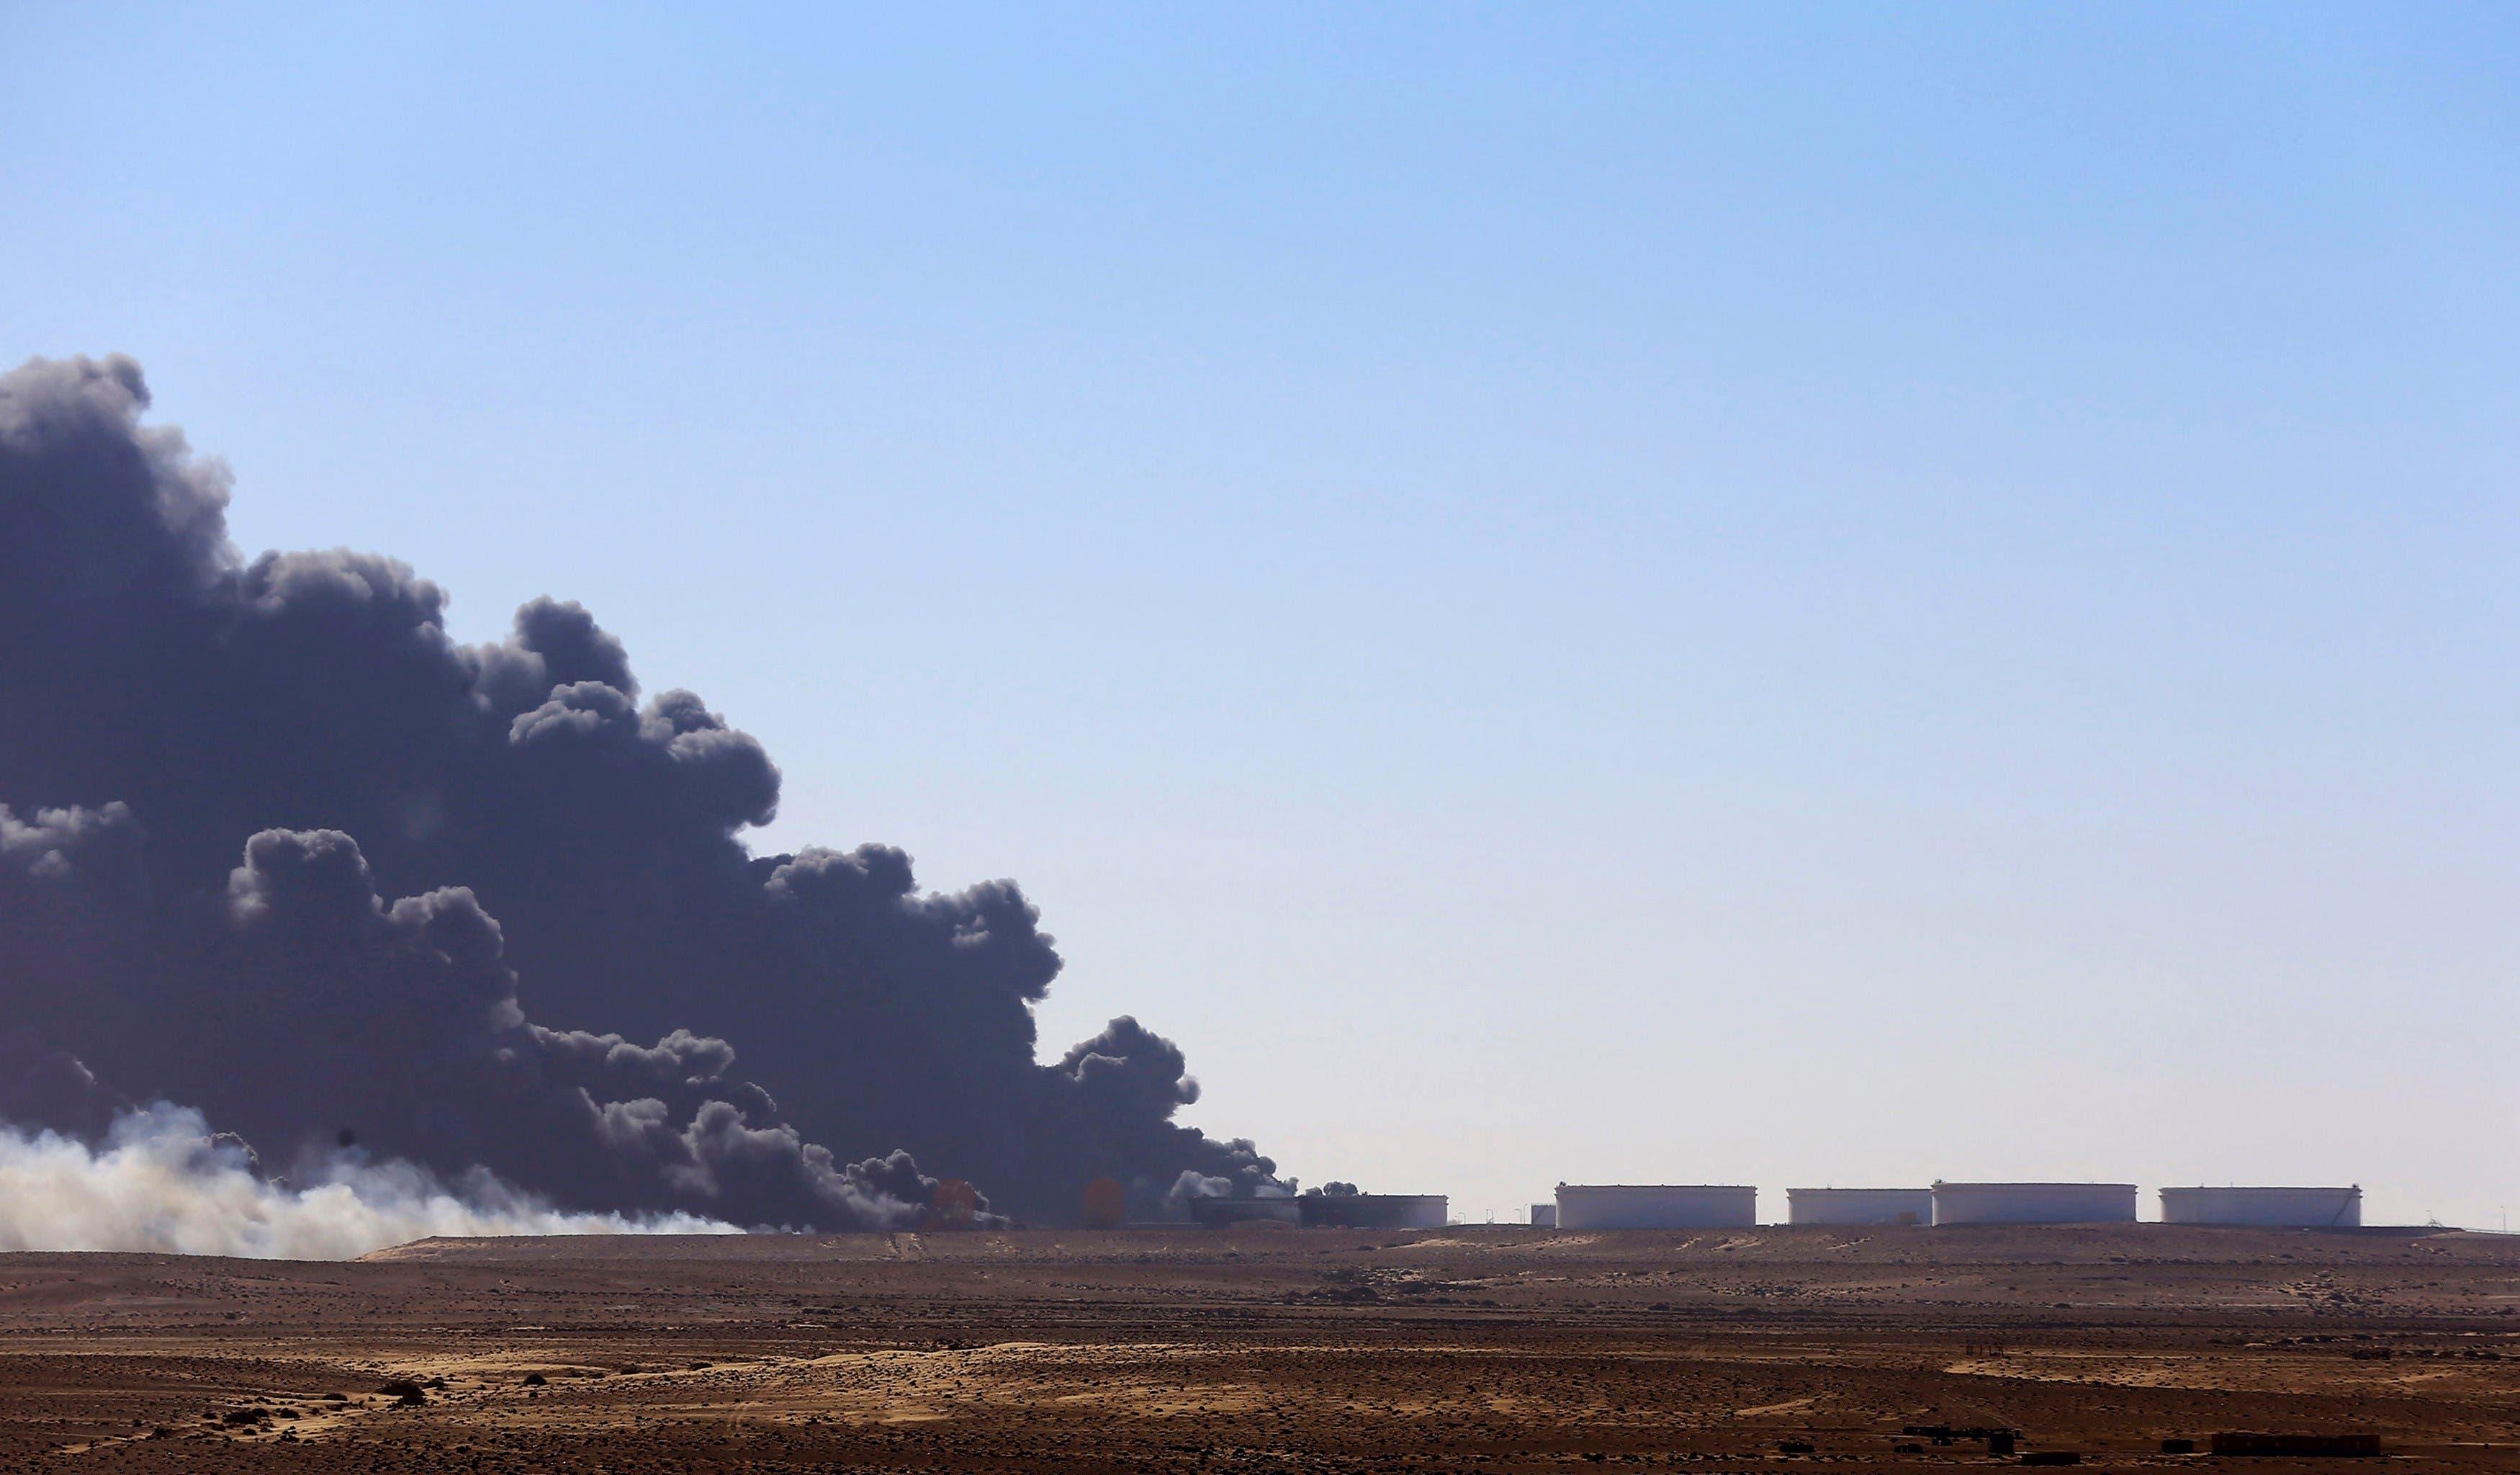 Libya's oil storage tanks on fire